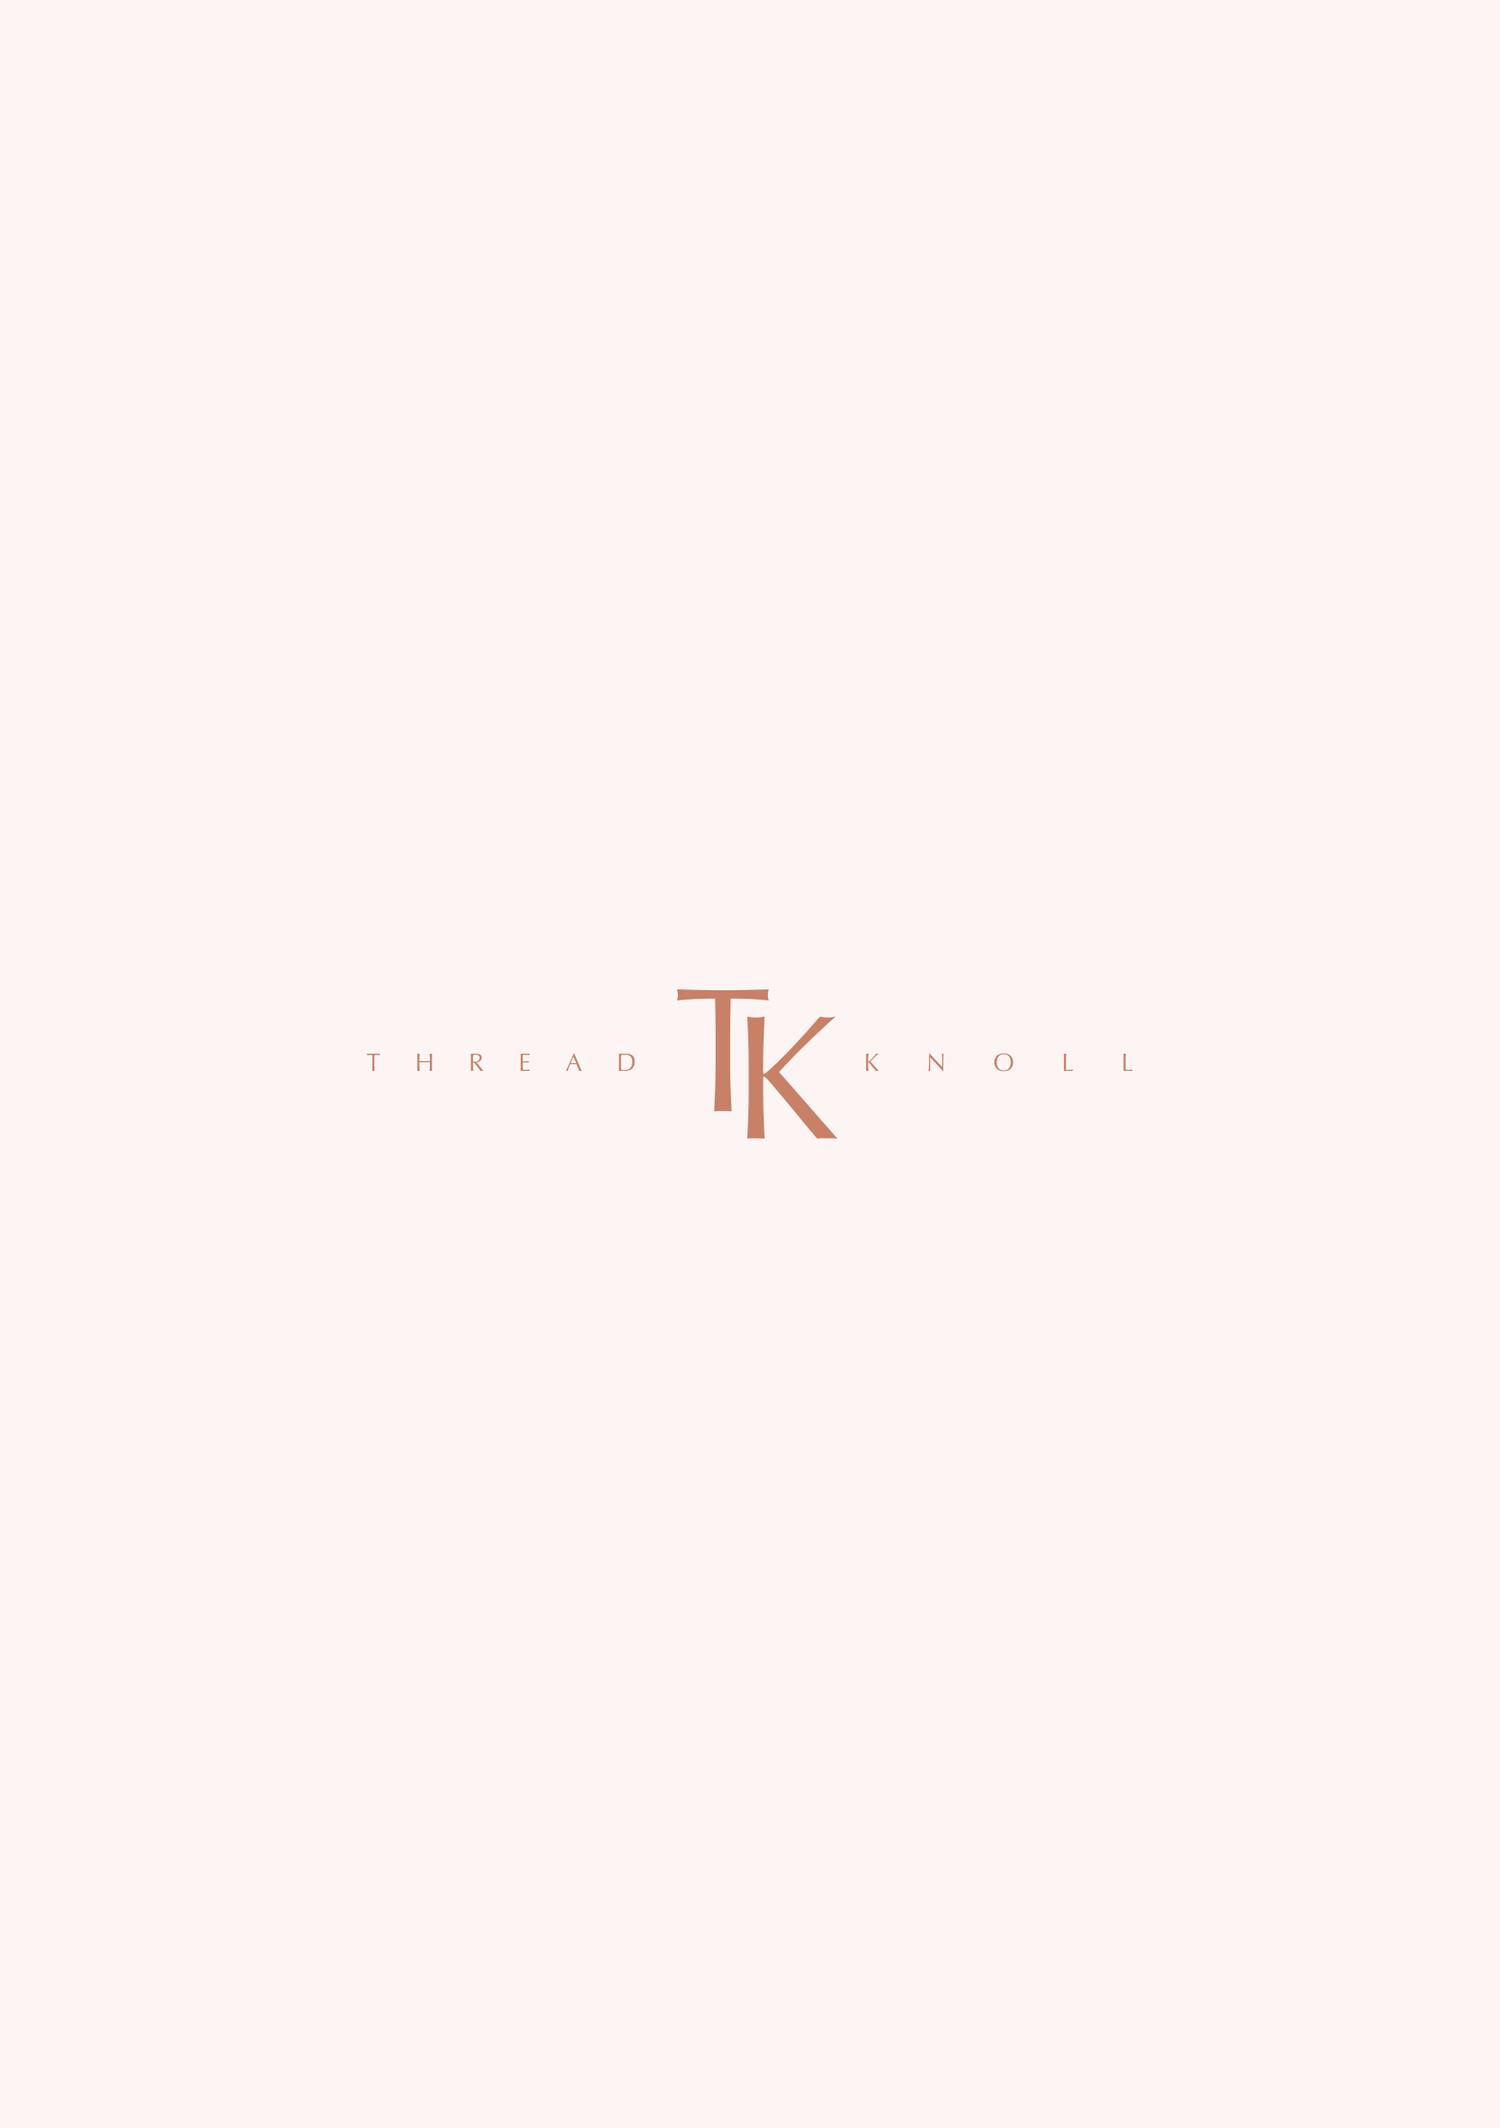 355a7cf0c thread + knoll   sieleth   Design   Graphic + Branding + Typography ...